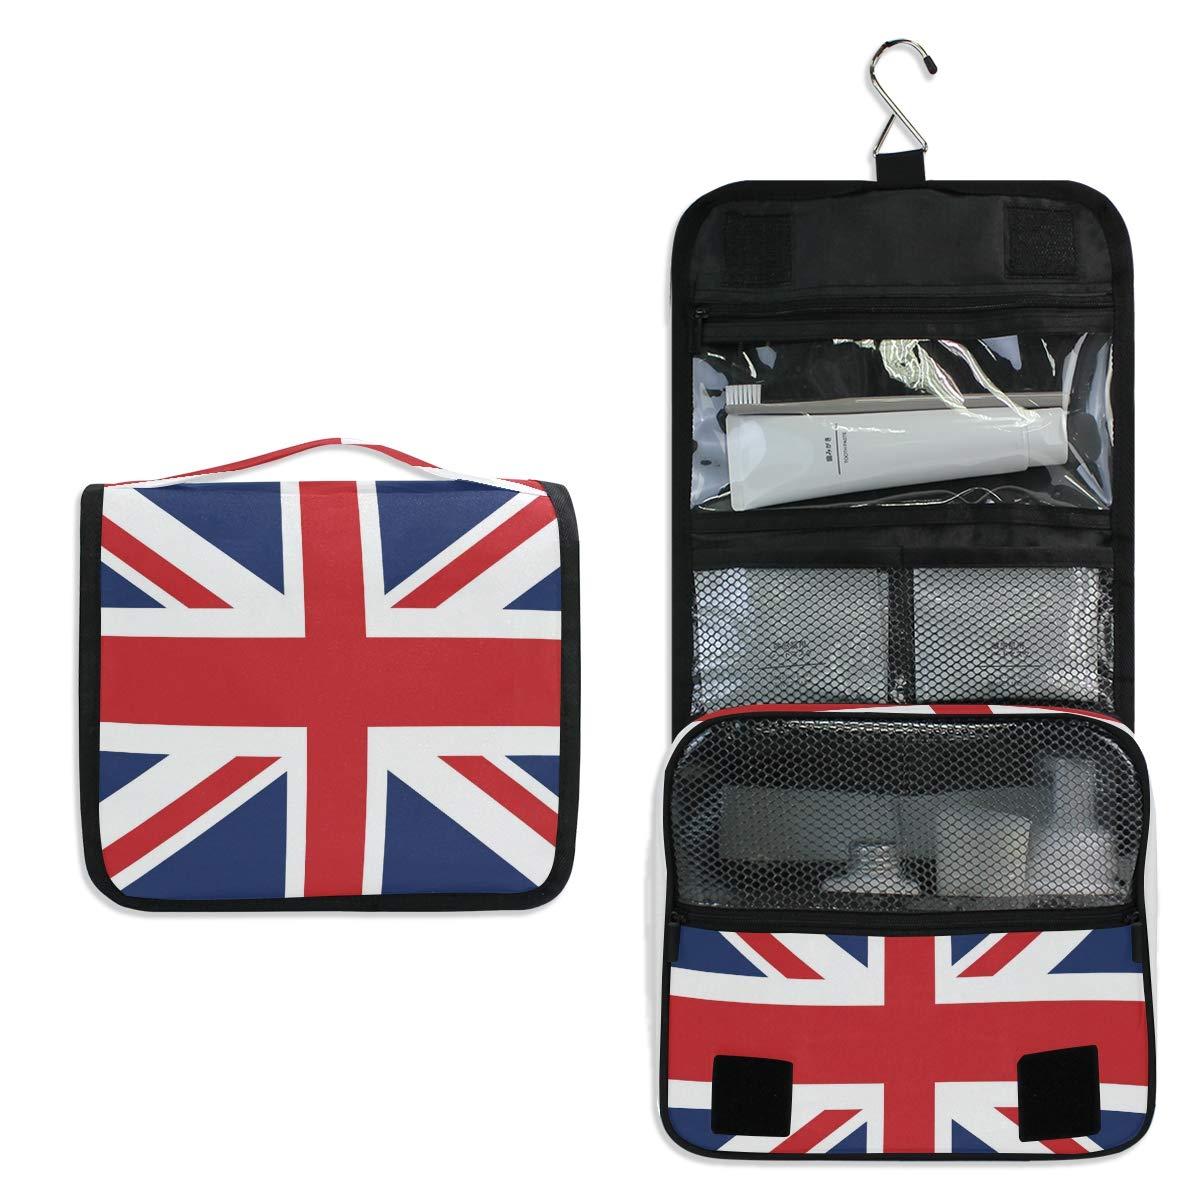 XLING Toiletry Bag British Union Jack Flag Stripe Wash Gargle Bag Travel Portable Cosmetic Makeup Brush Case with Hanging Hook Organizer for Women Men